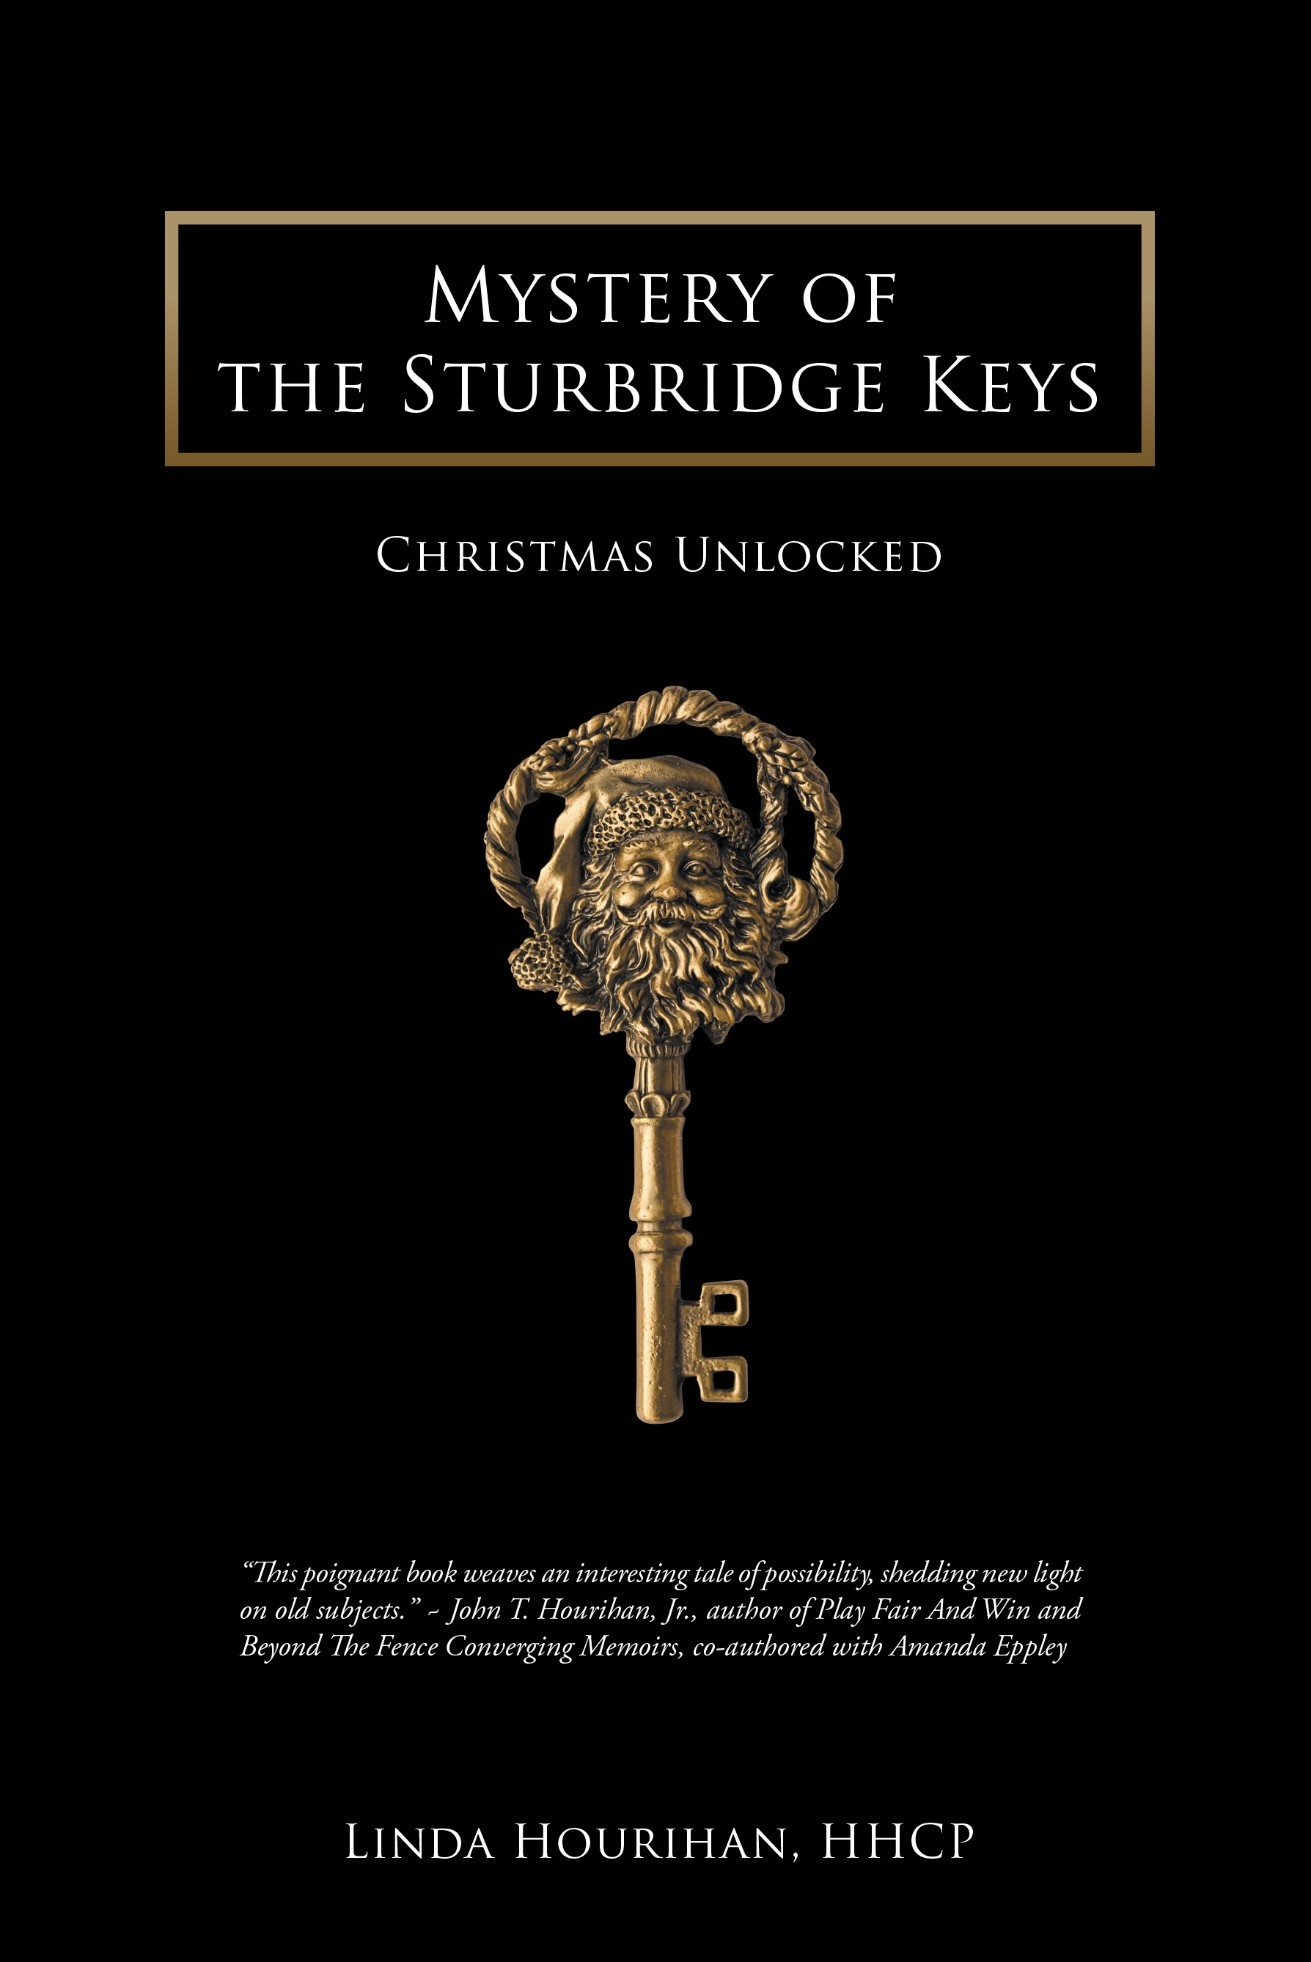 Truth – MYSTERY OF THE STURBRIDGE KEYS